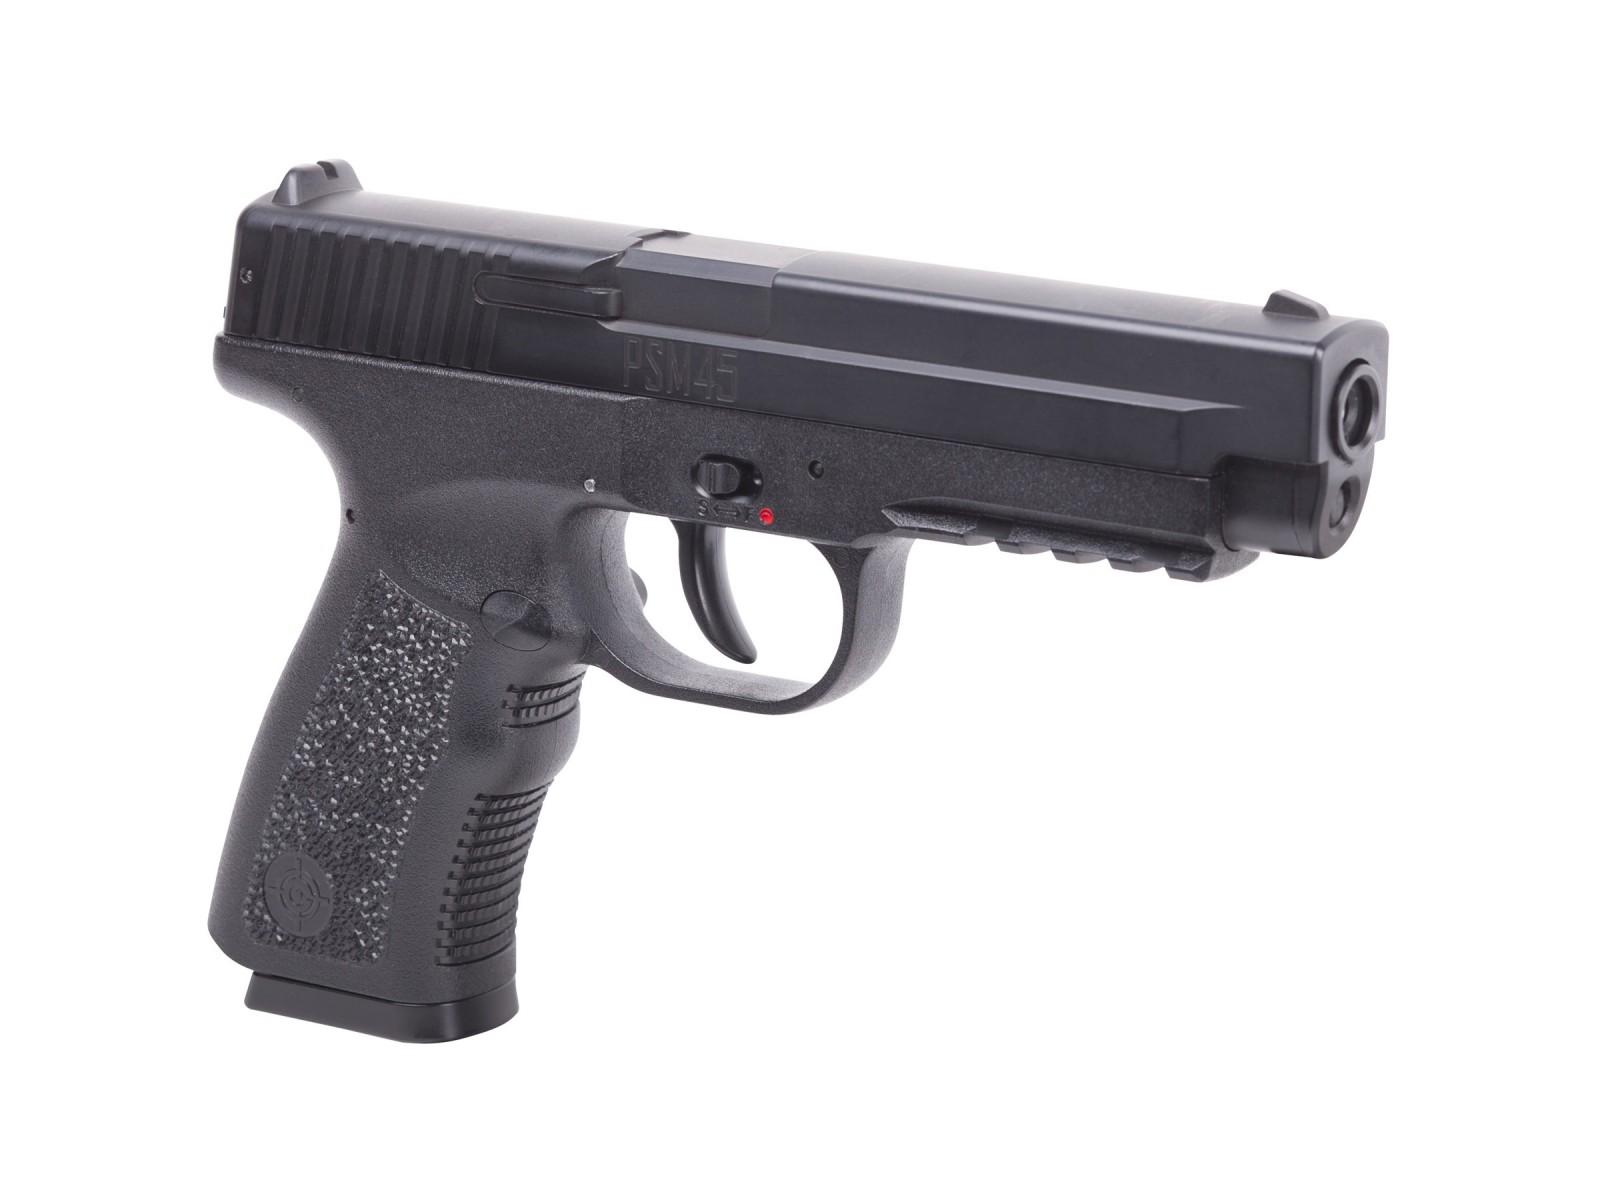 Pistol PSM: specifications, photos 62